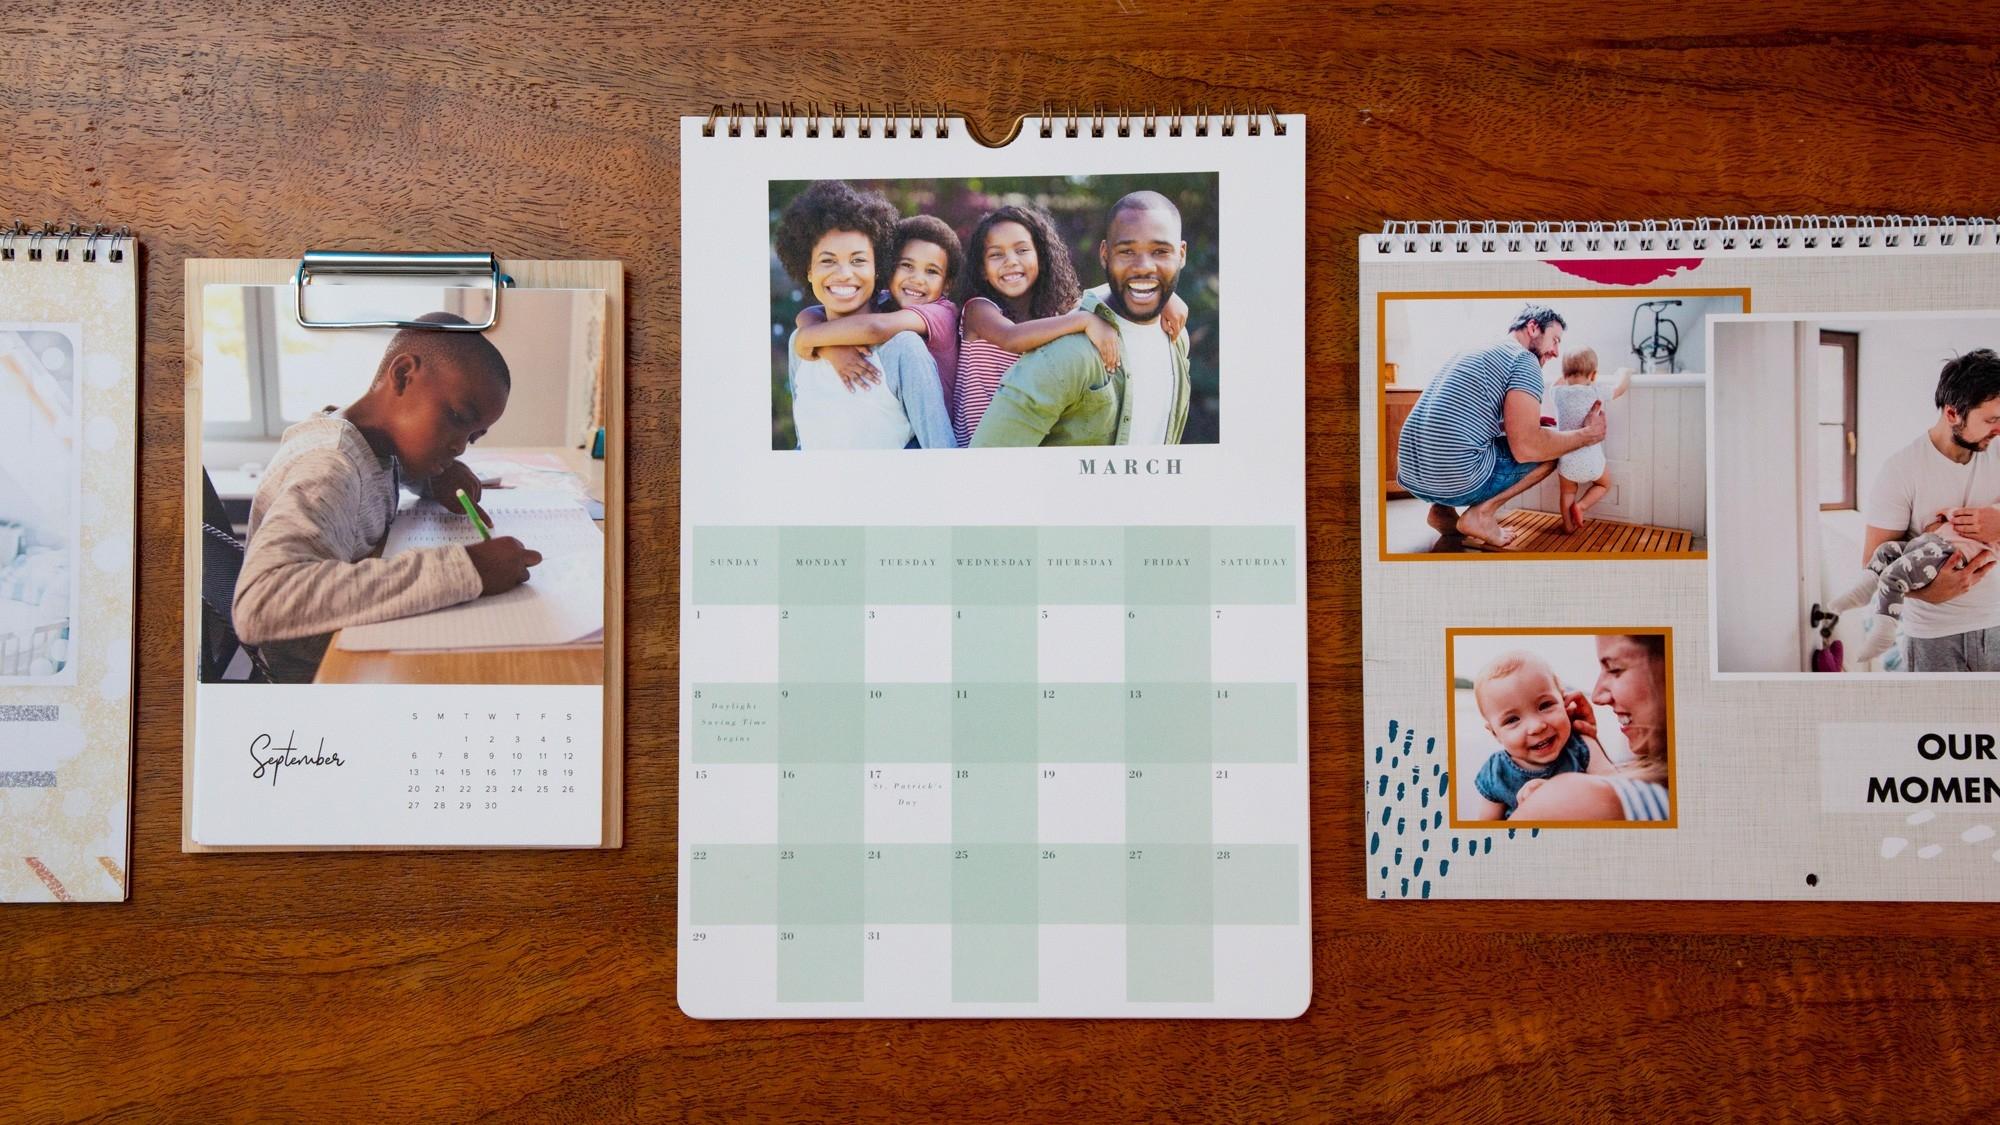 Best Photo Calendars 2019 | Tom's Guide-8.5 X 14 Calendar Template